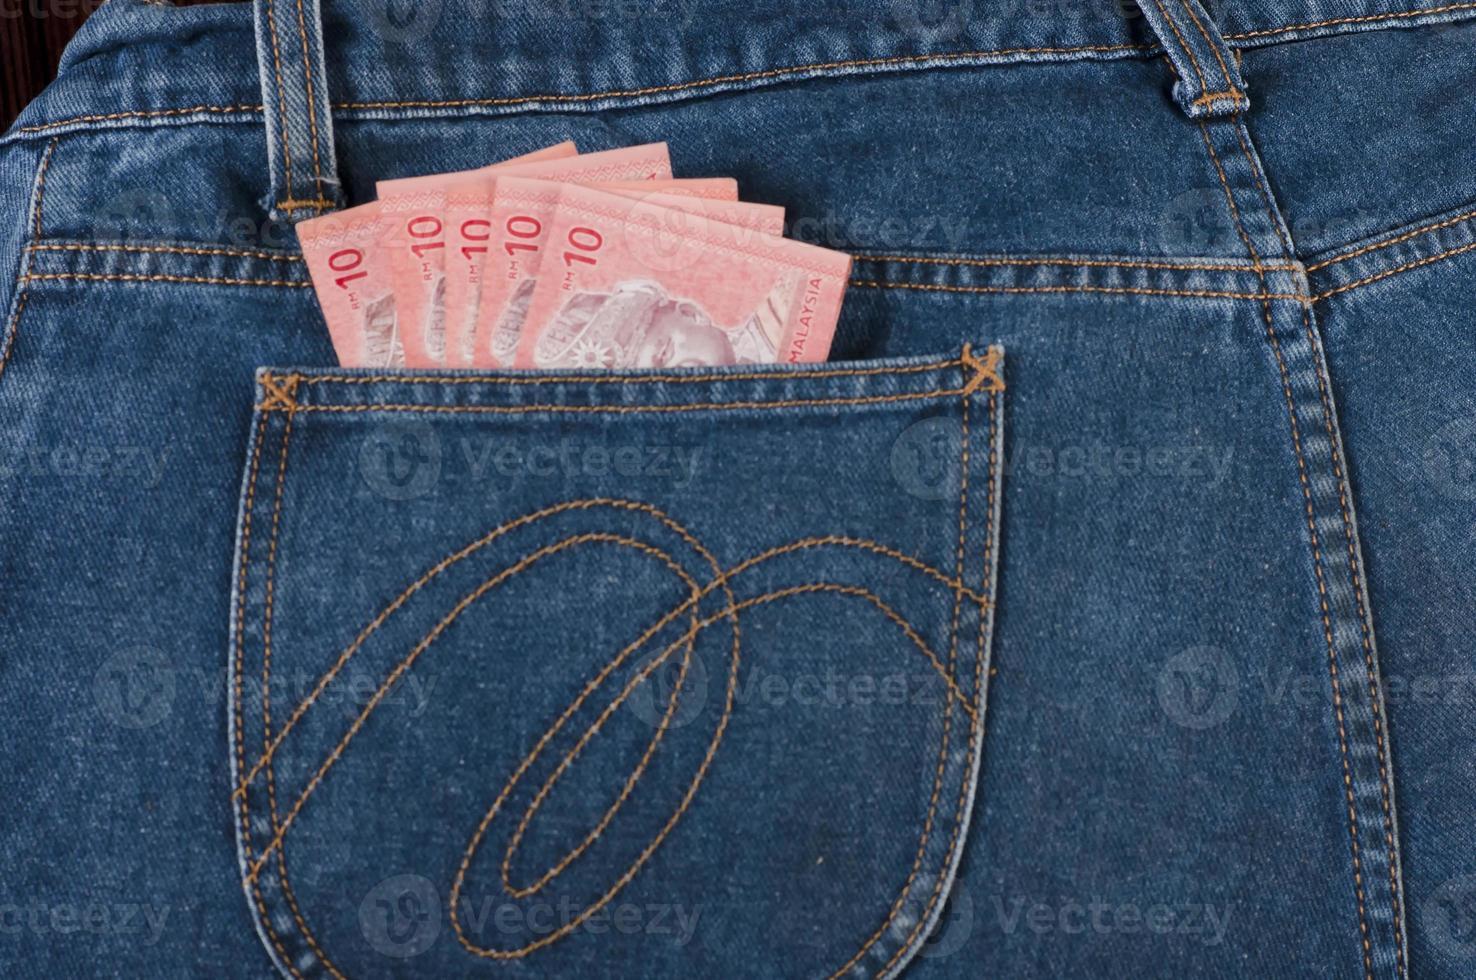 Billete de malasia en el bolsillo de jeans foto